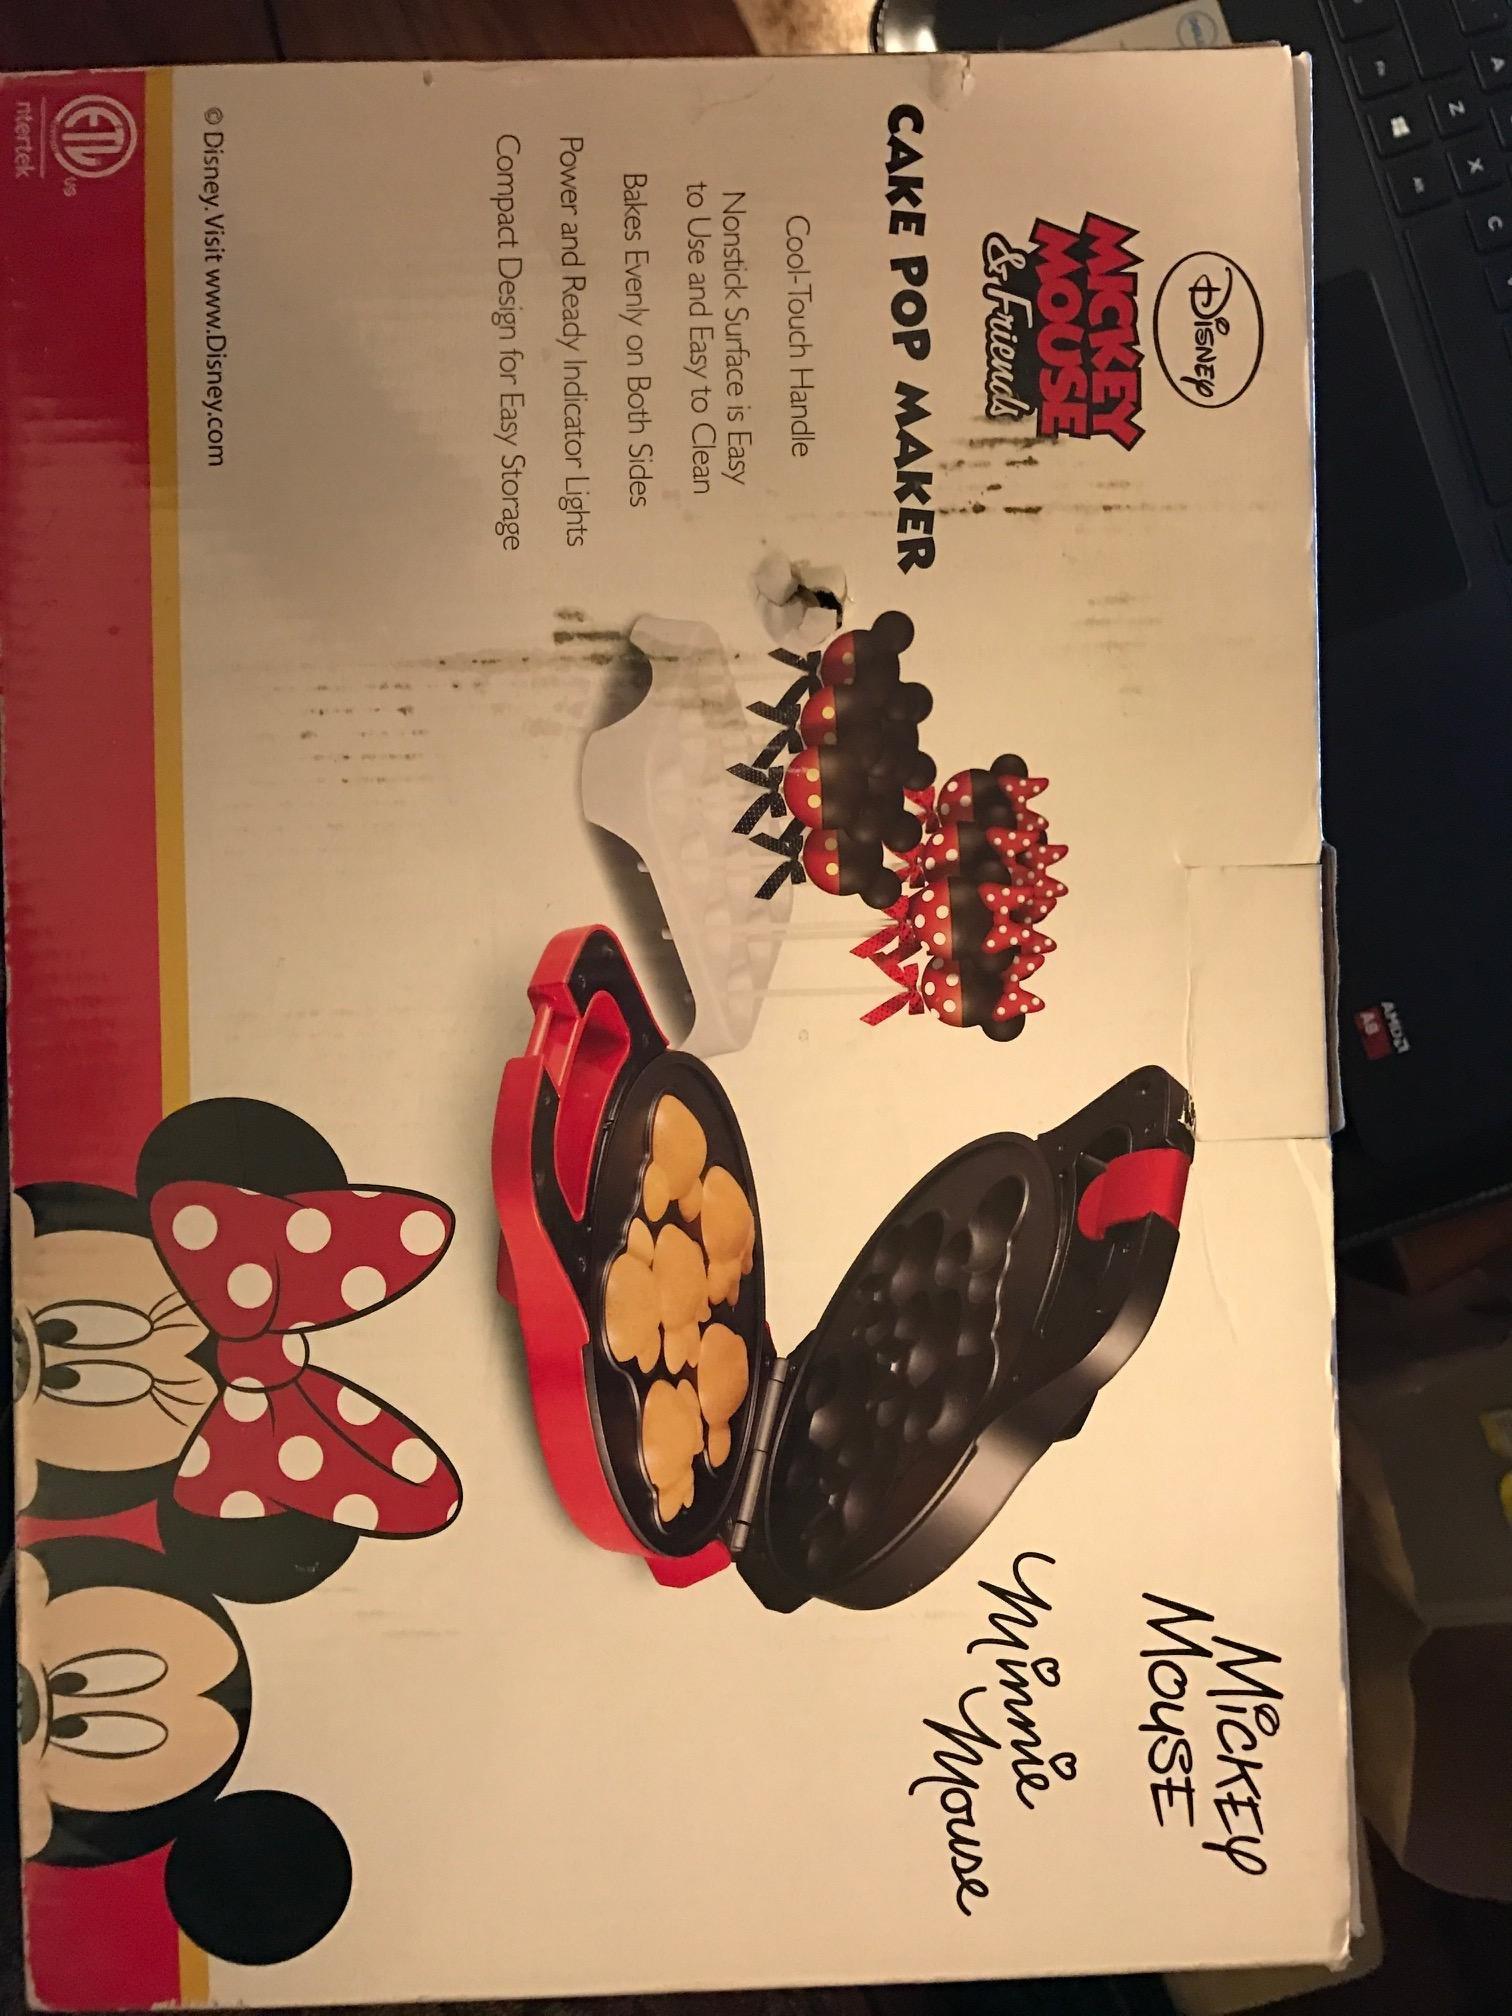 Disney Mickey Mouse & Friends Cake Pop Maker by Disney (Image #3)